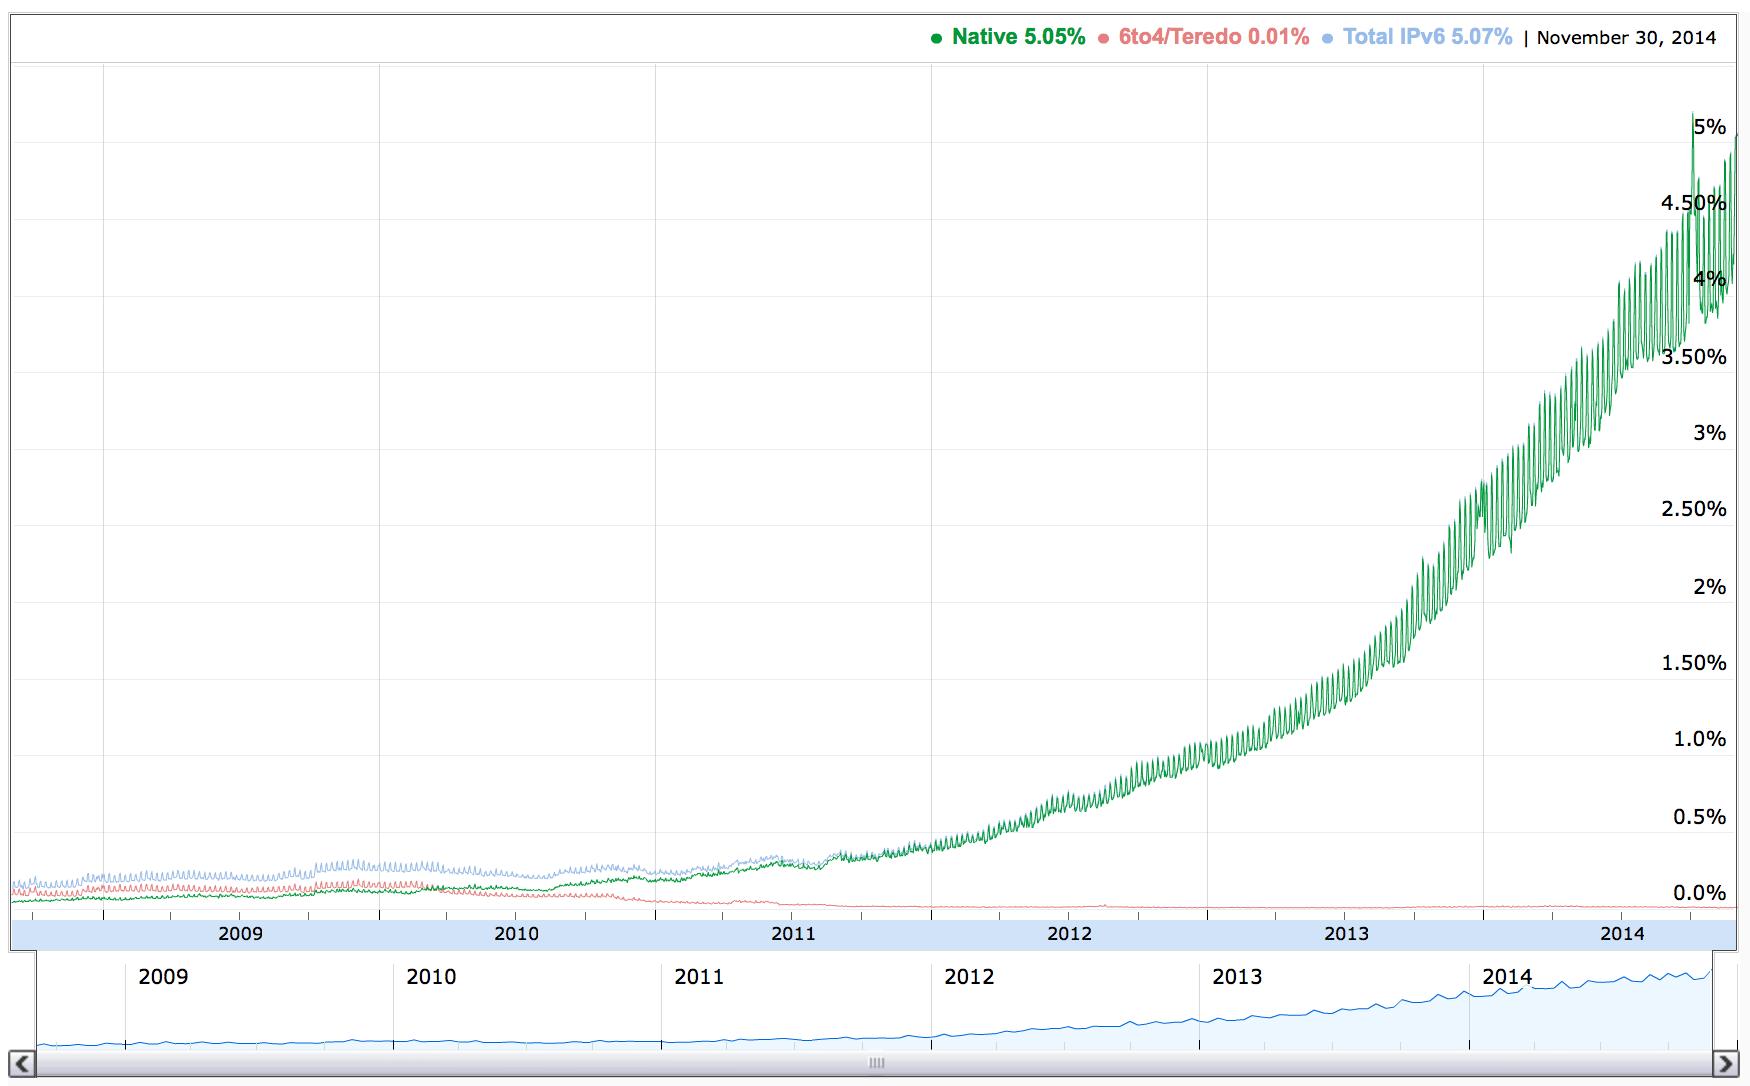 Google IPv6 Traffic Passes 5% - IPv6 Internet Growing Faster than IPv4!